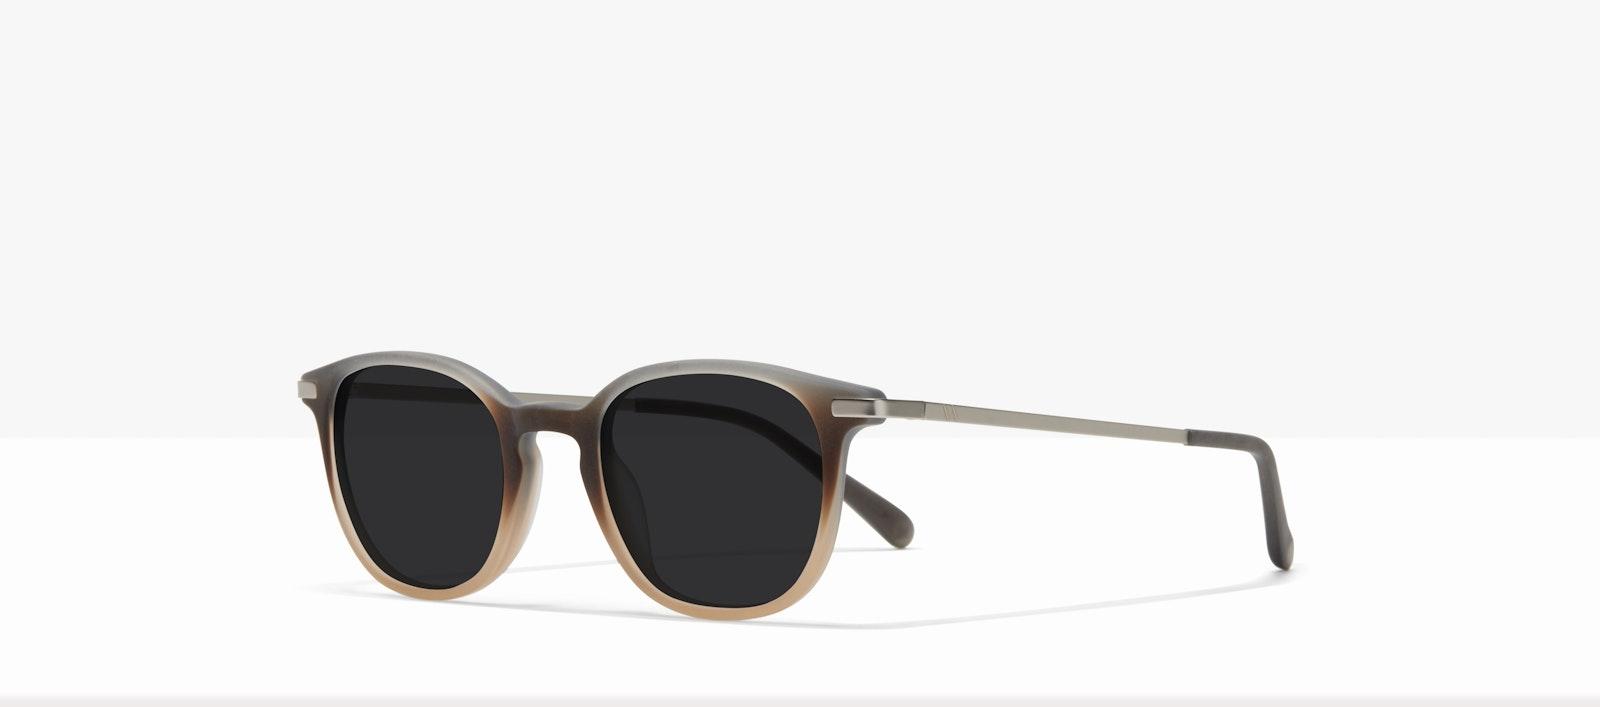 Affordable Fashion Glasses Round Sunglasses Men Tux M Matte Fog Tilt